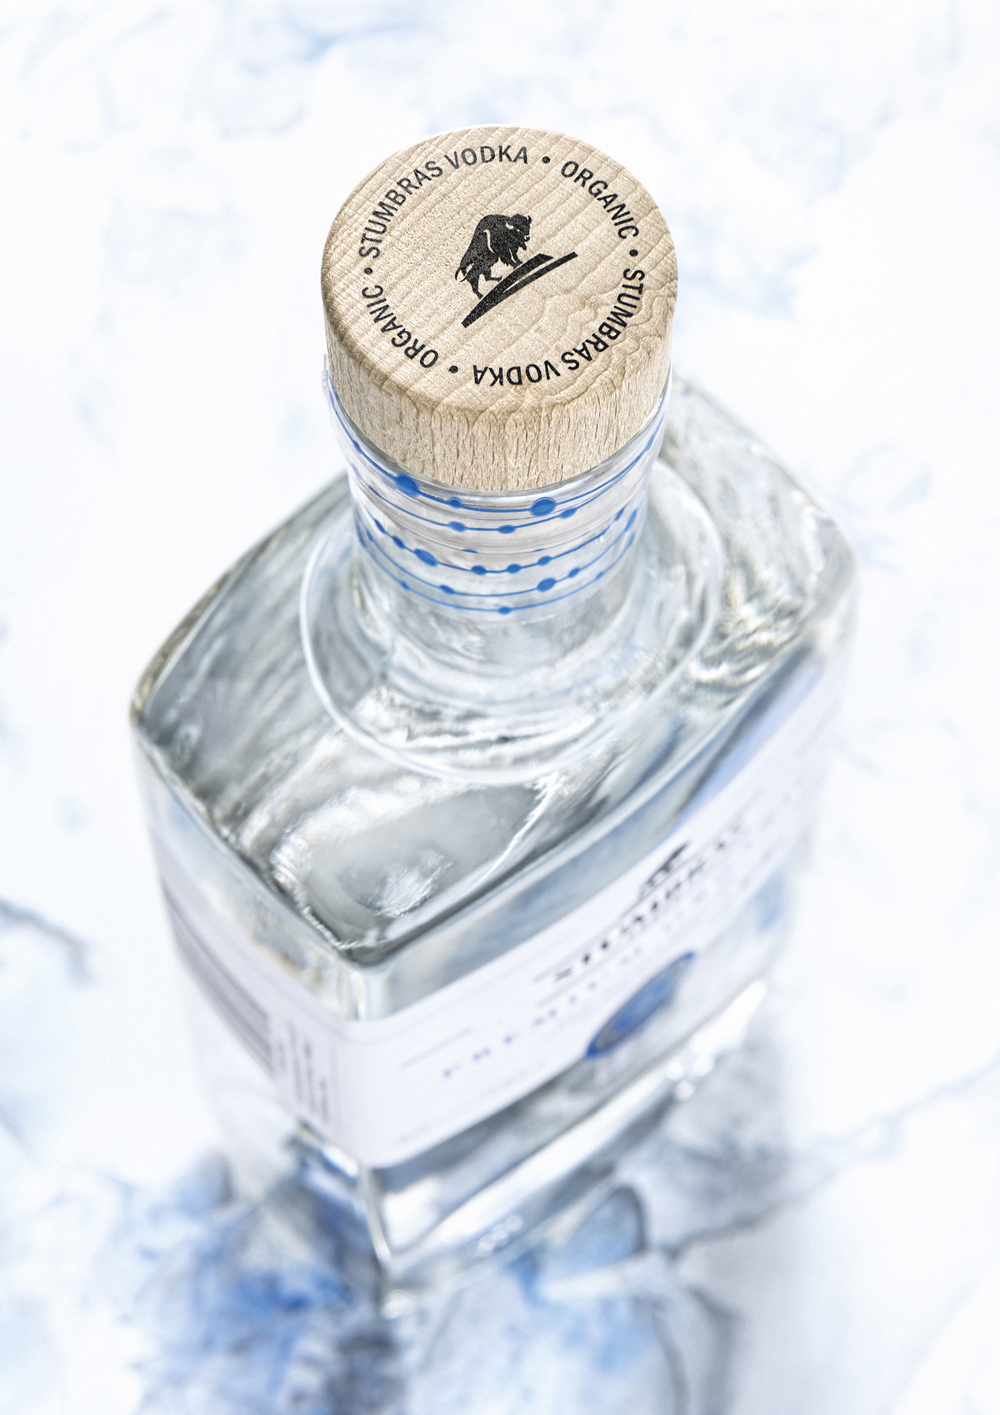 Stumbras_Vodka_Premium_Organic_4_2400px.jpg